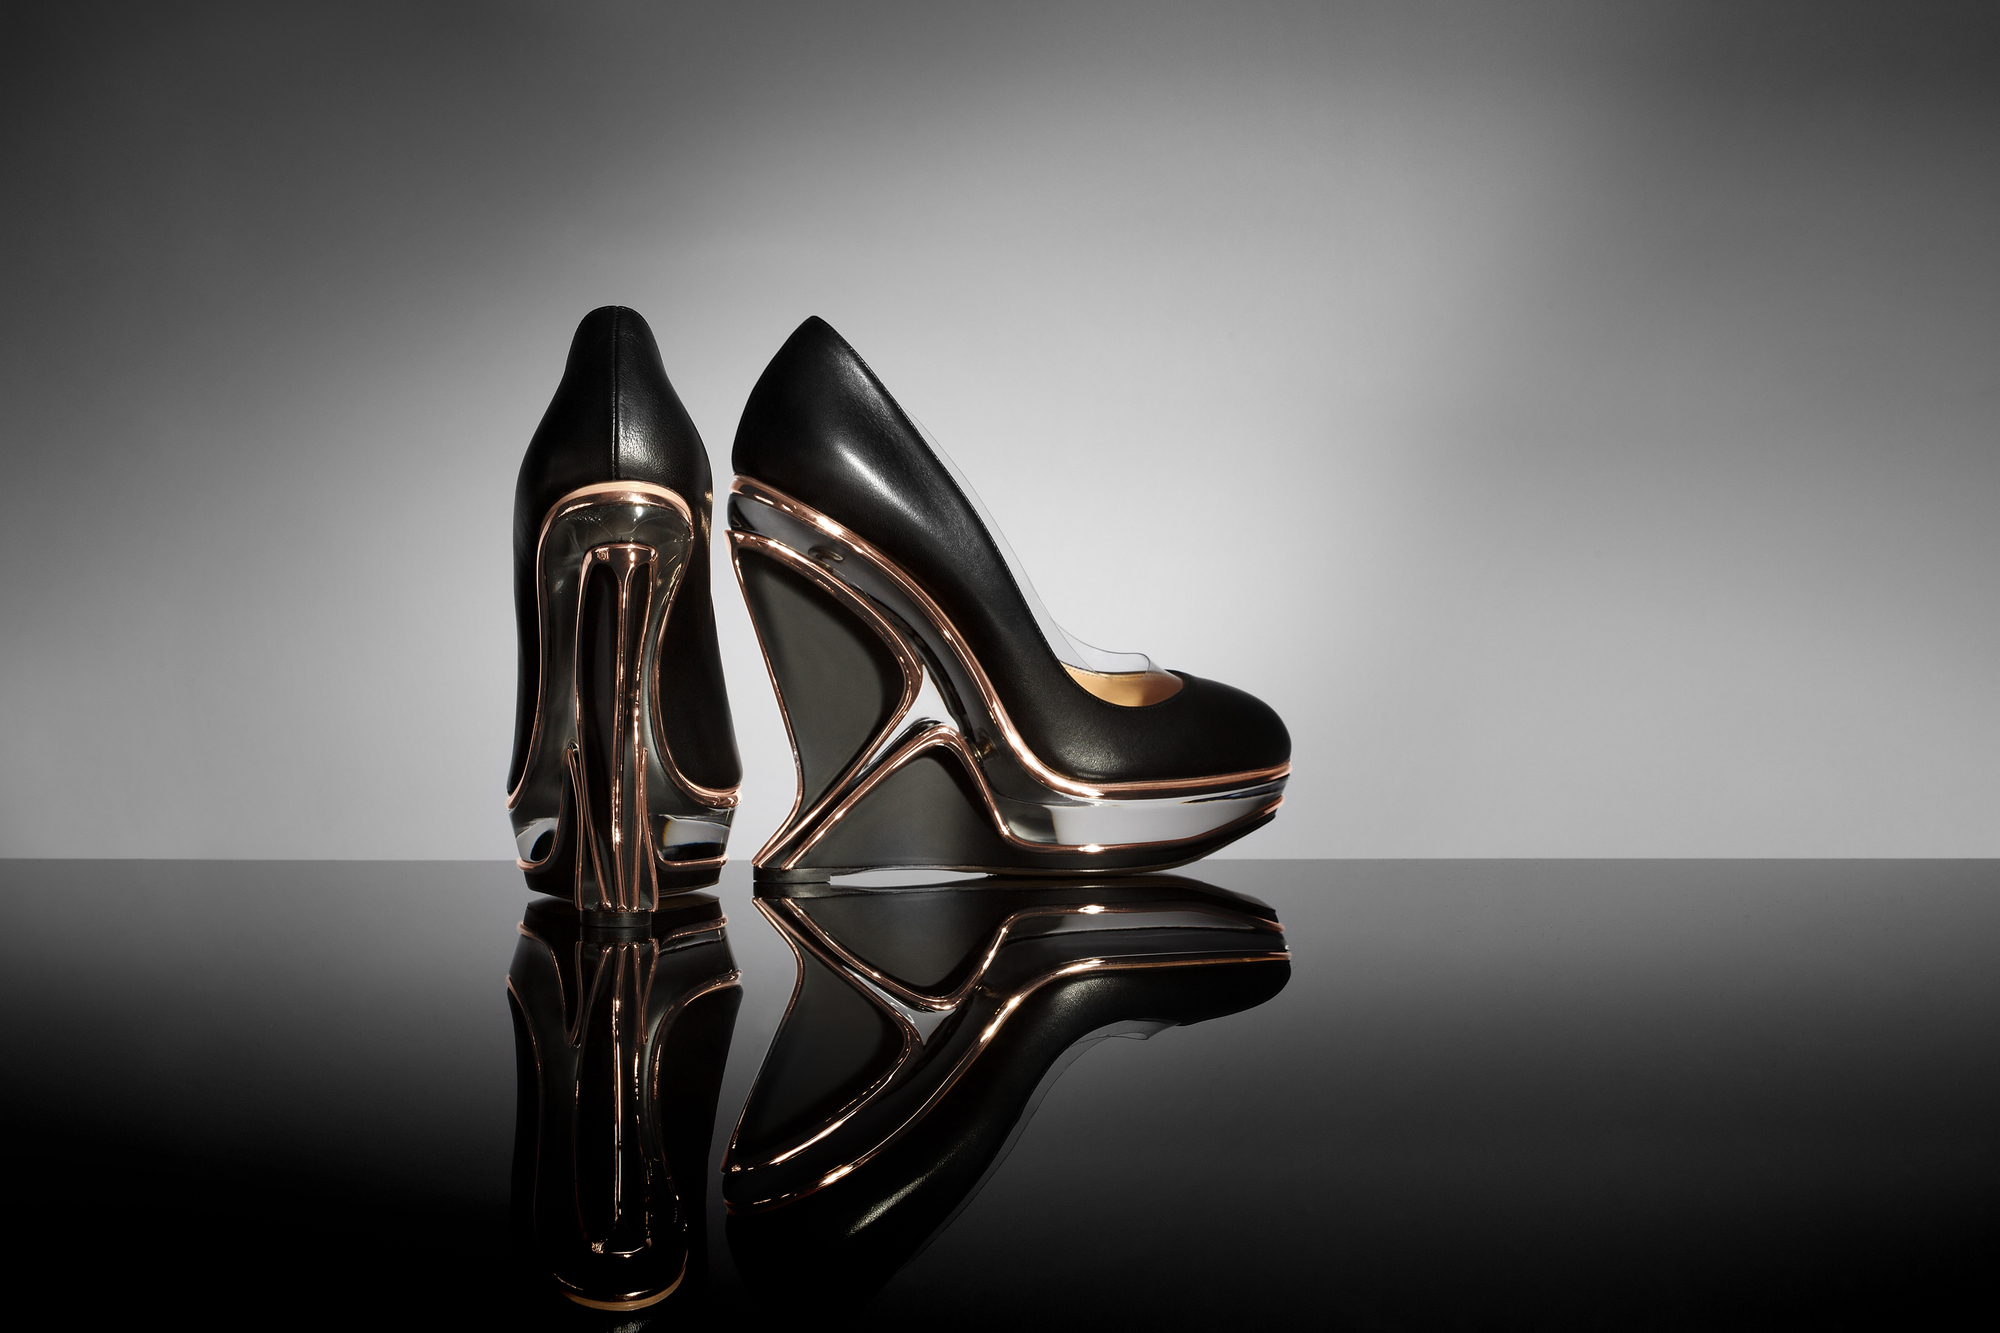 Fashion style Hadid zaha designs shoes for lady